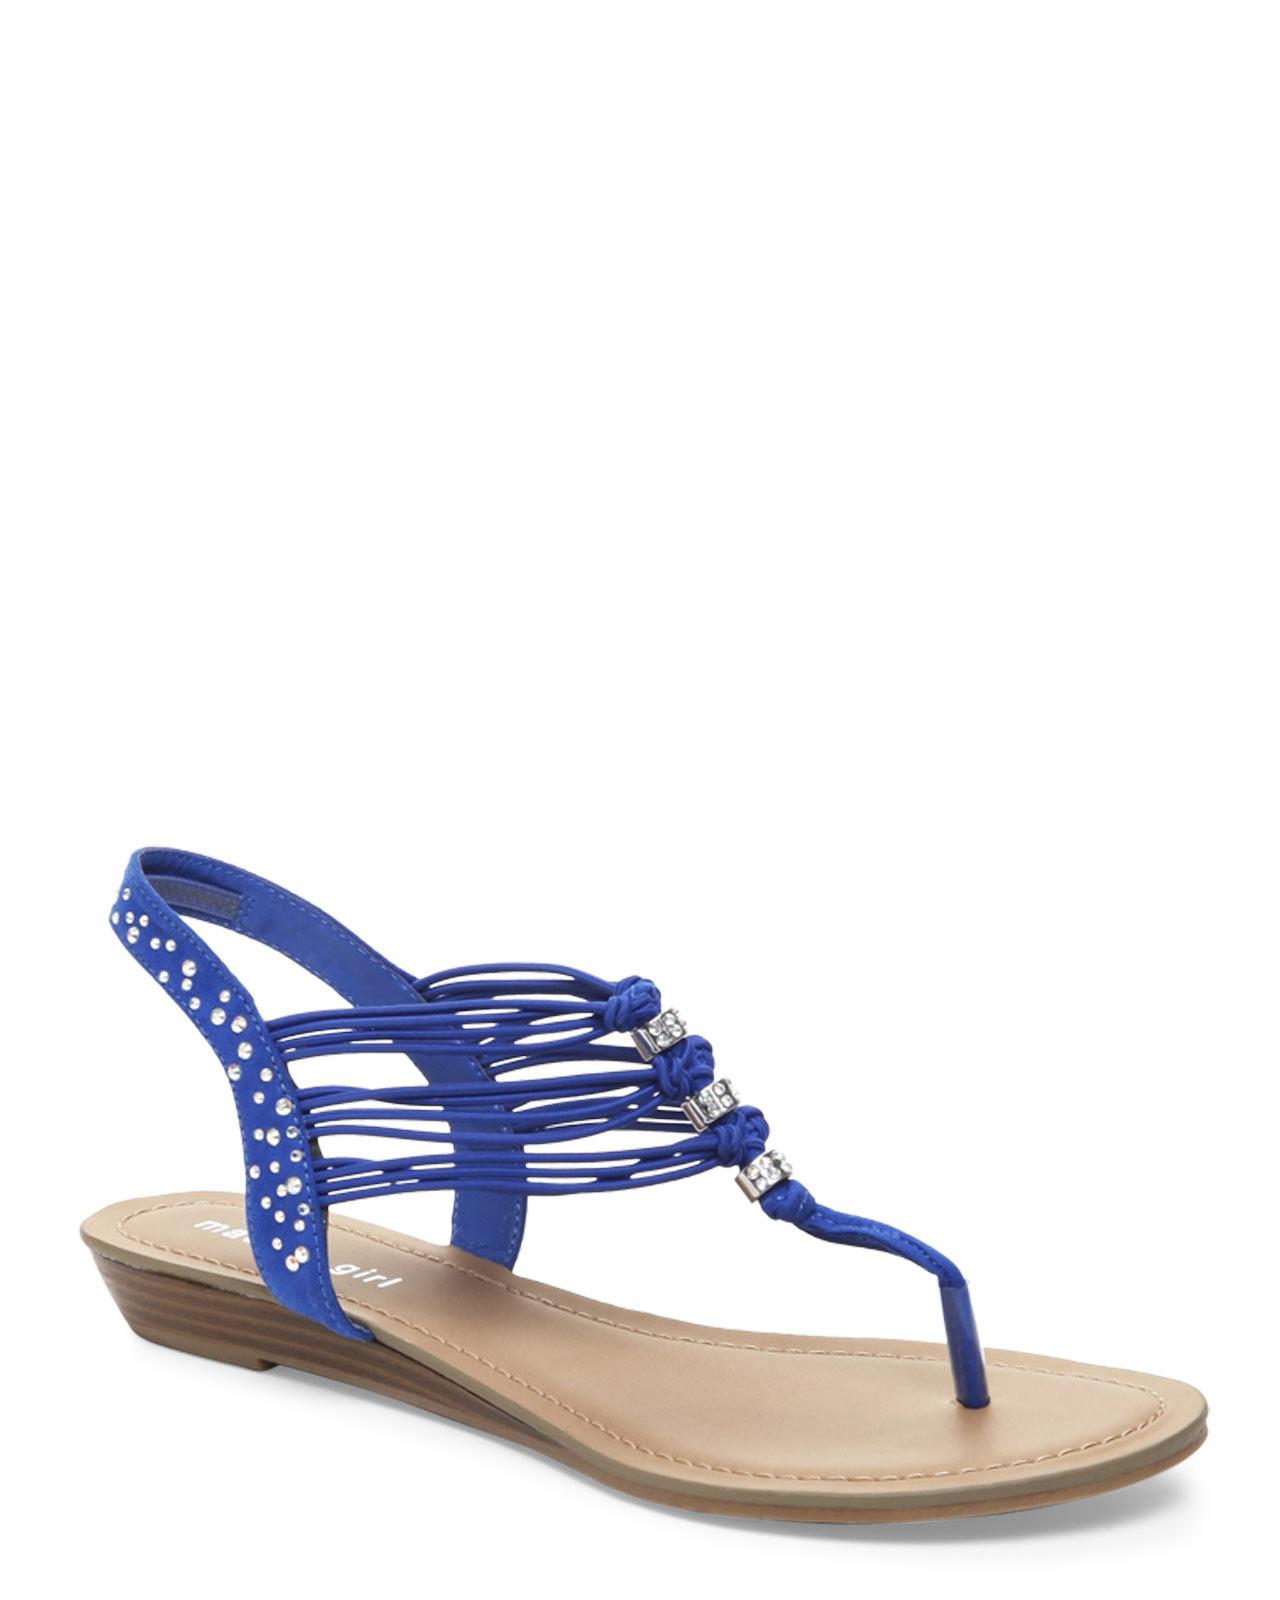 Madden Girl Blue Thrill Strappy Sandals In Blue Lyst